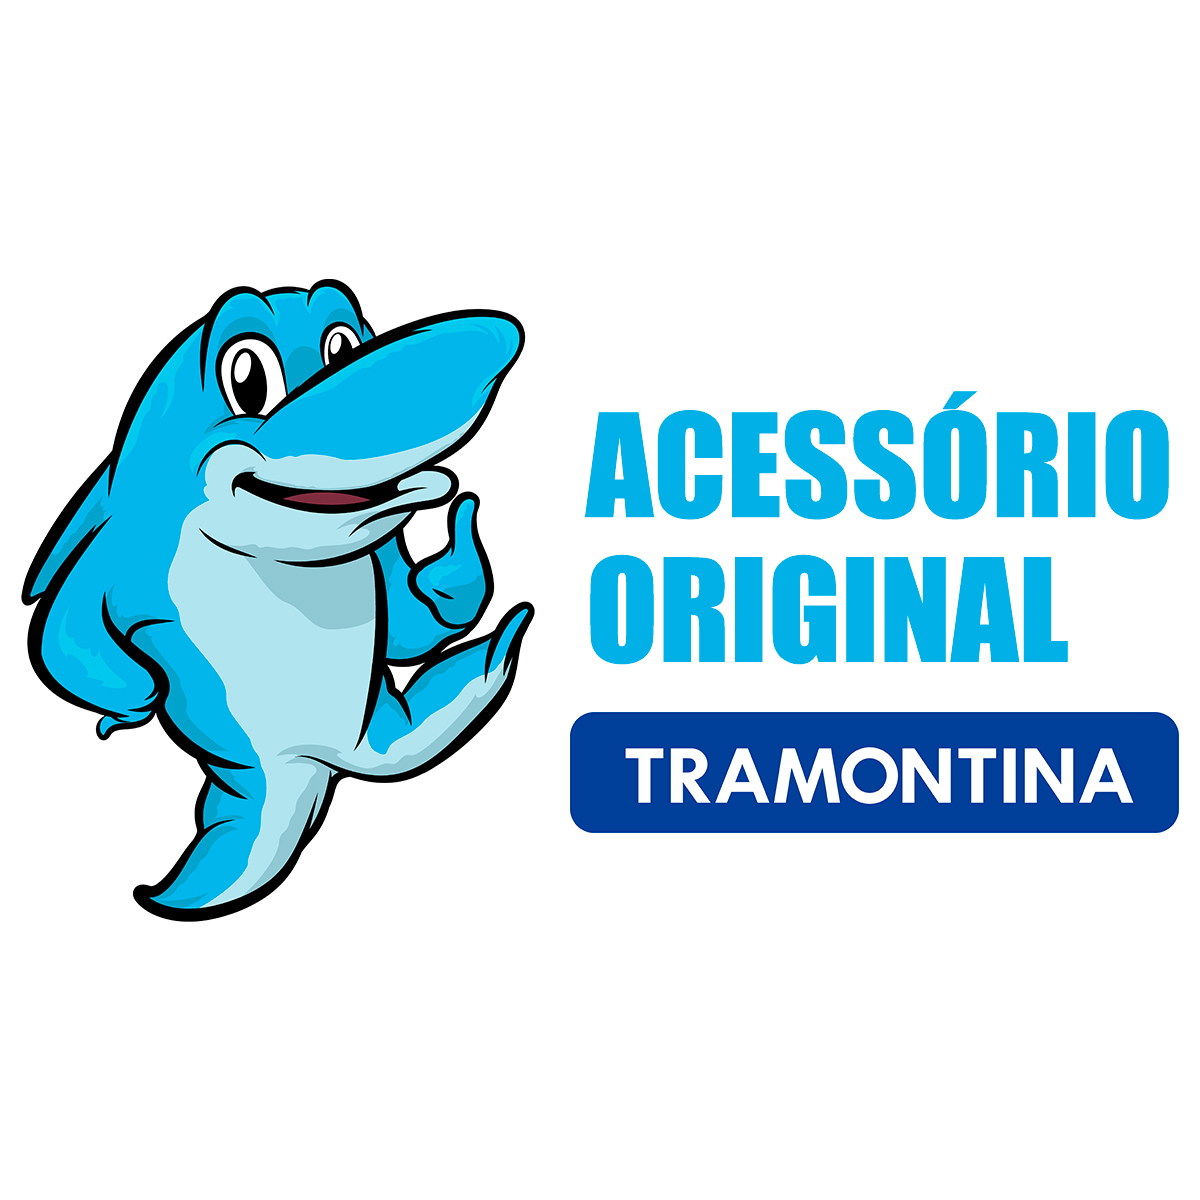 Bico Lança para Lavadora Tramontina 1950psi 1800w Original